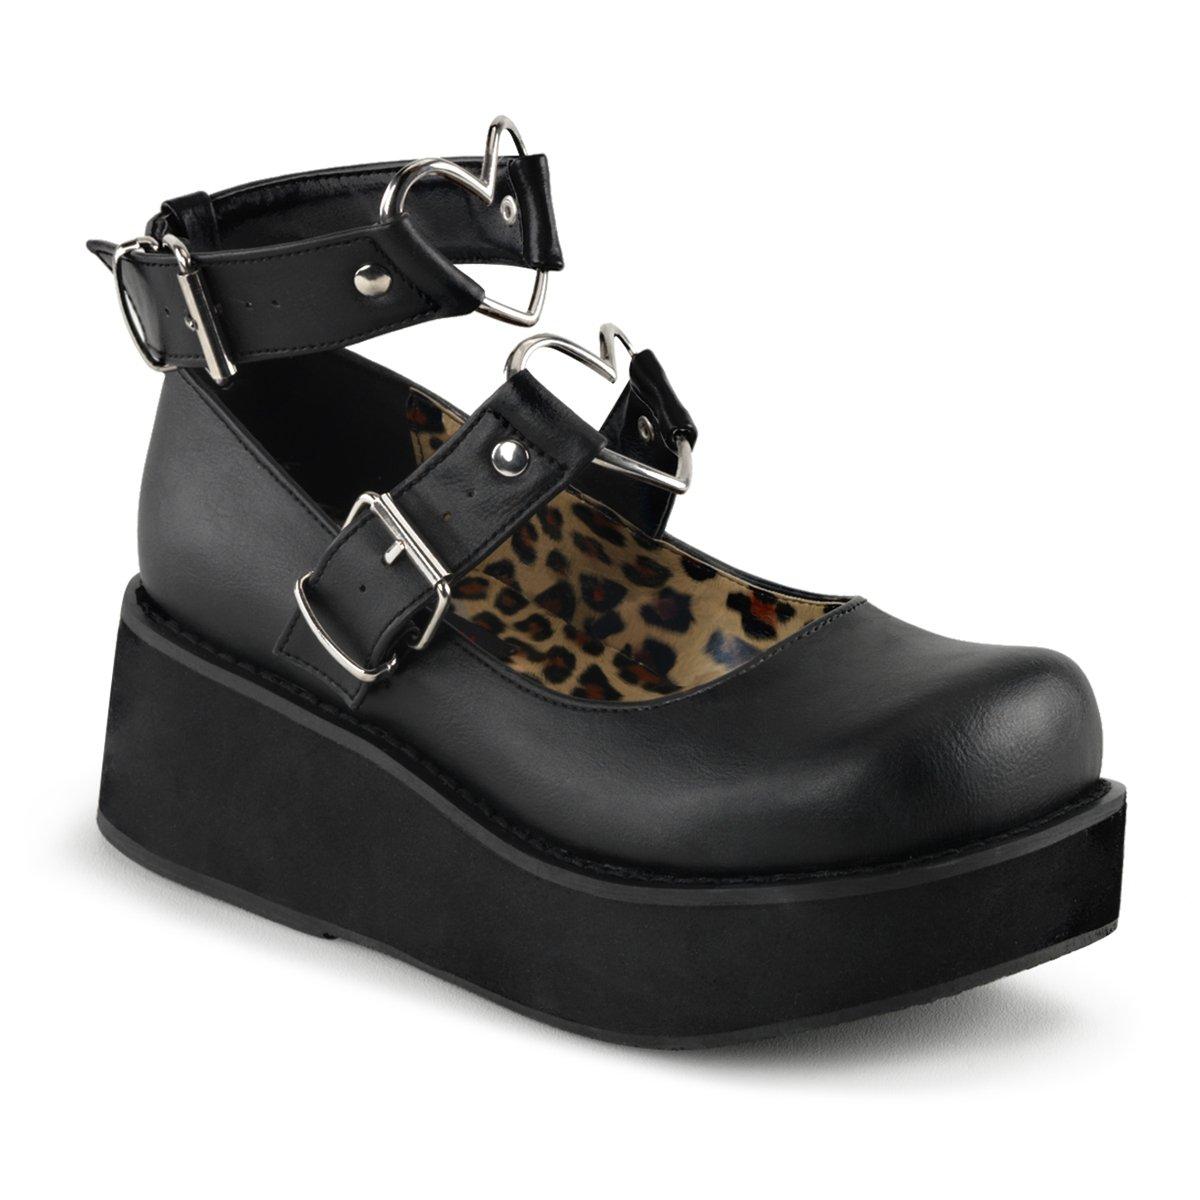 Demonia SPRITE-02 Womens Boots B016DAA2US 6 B(M) US Blk Vegan Leather